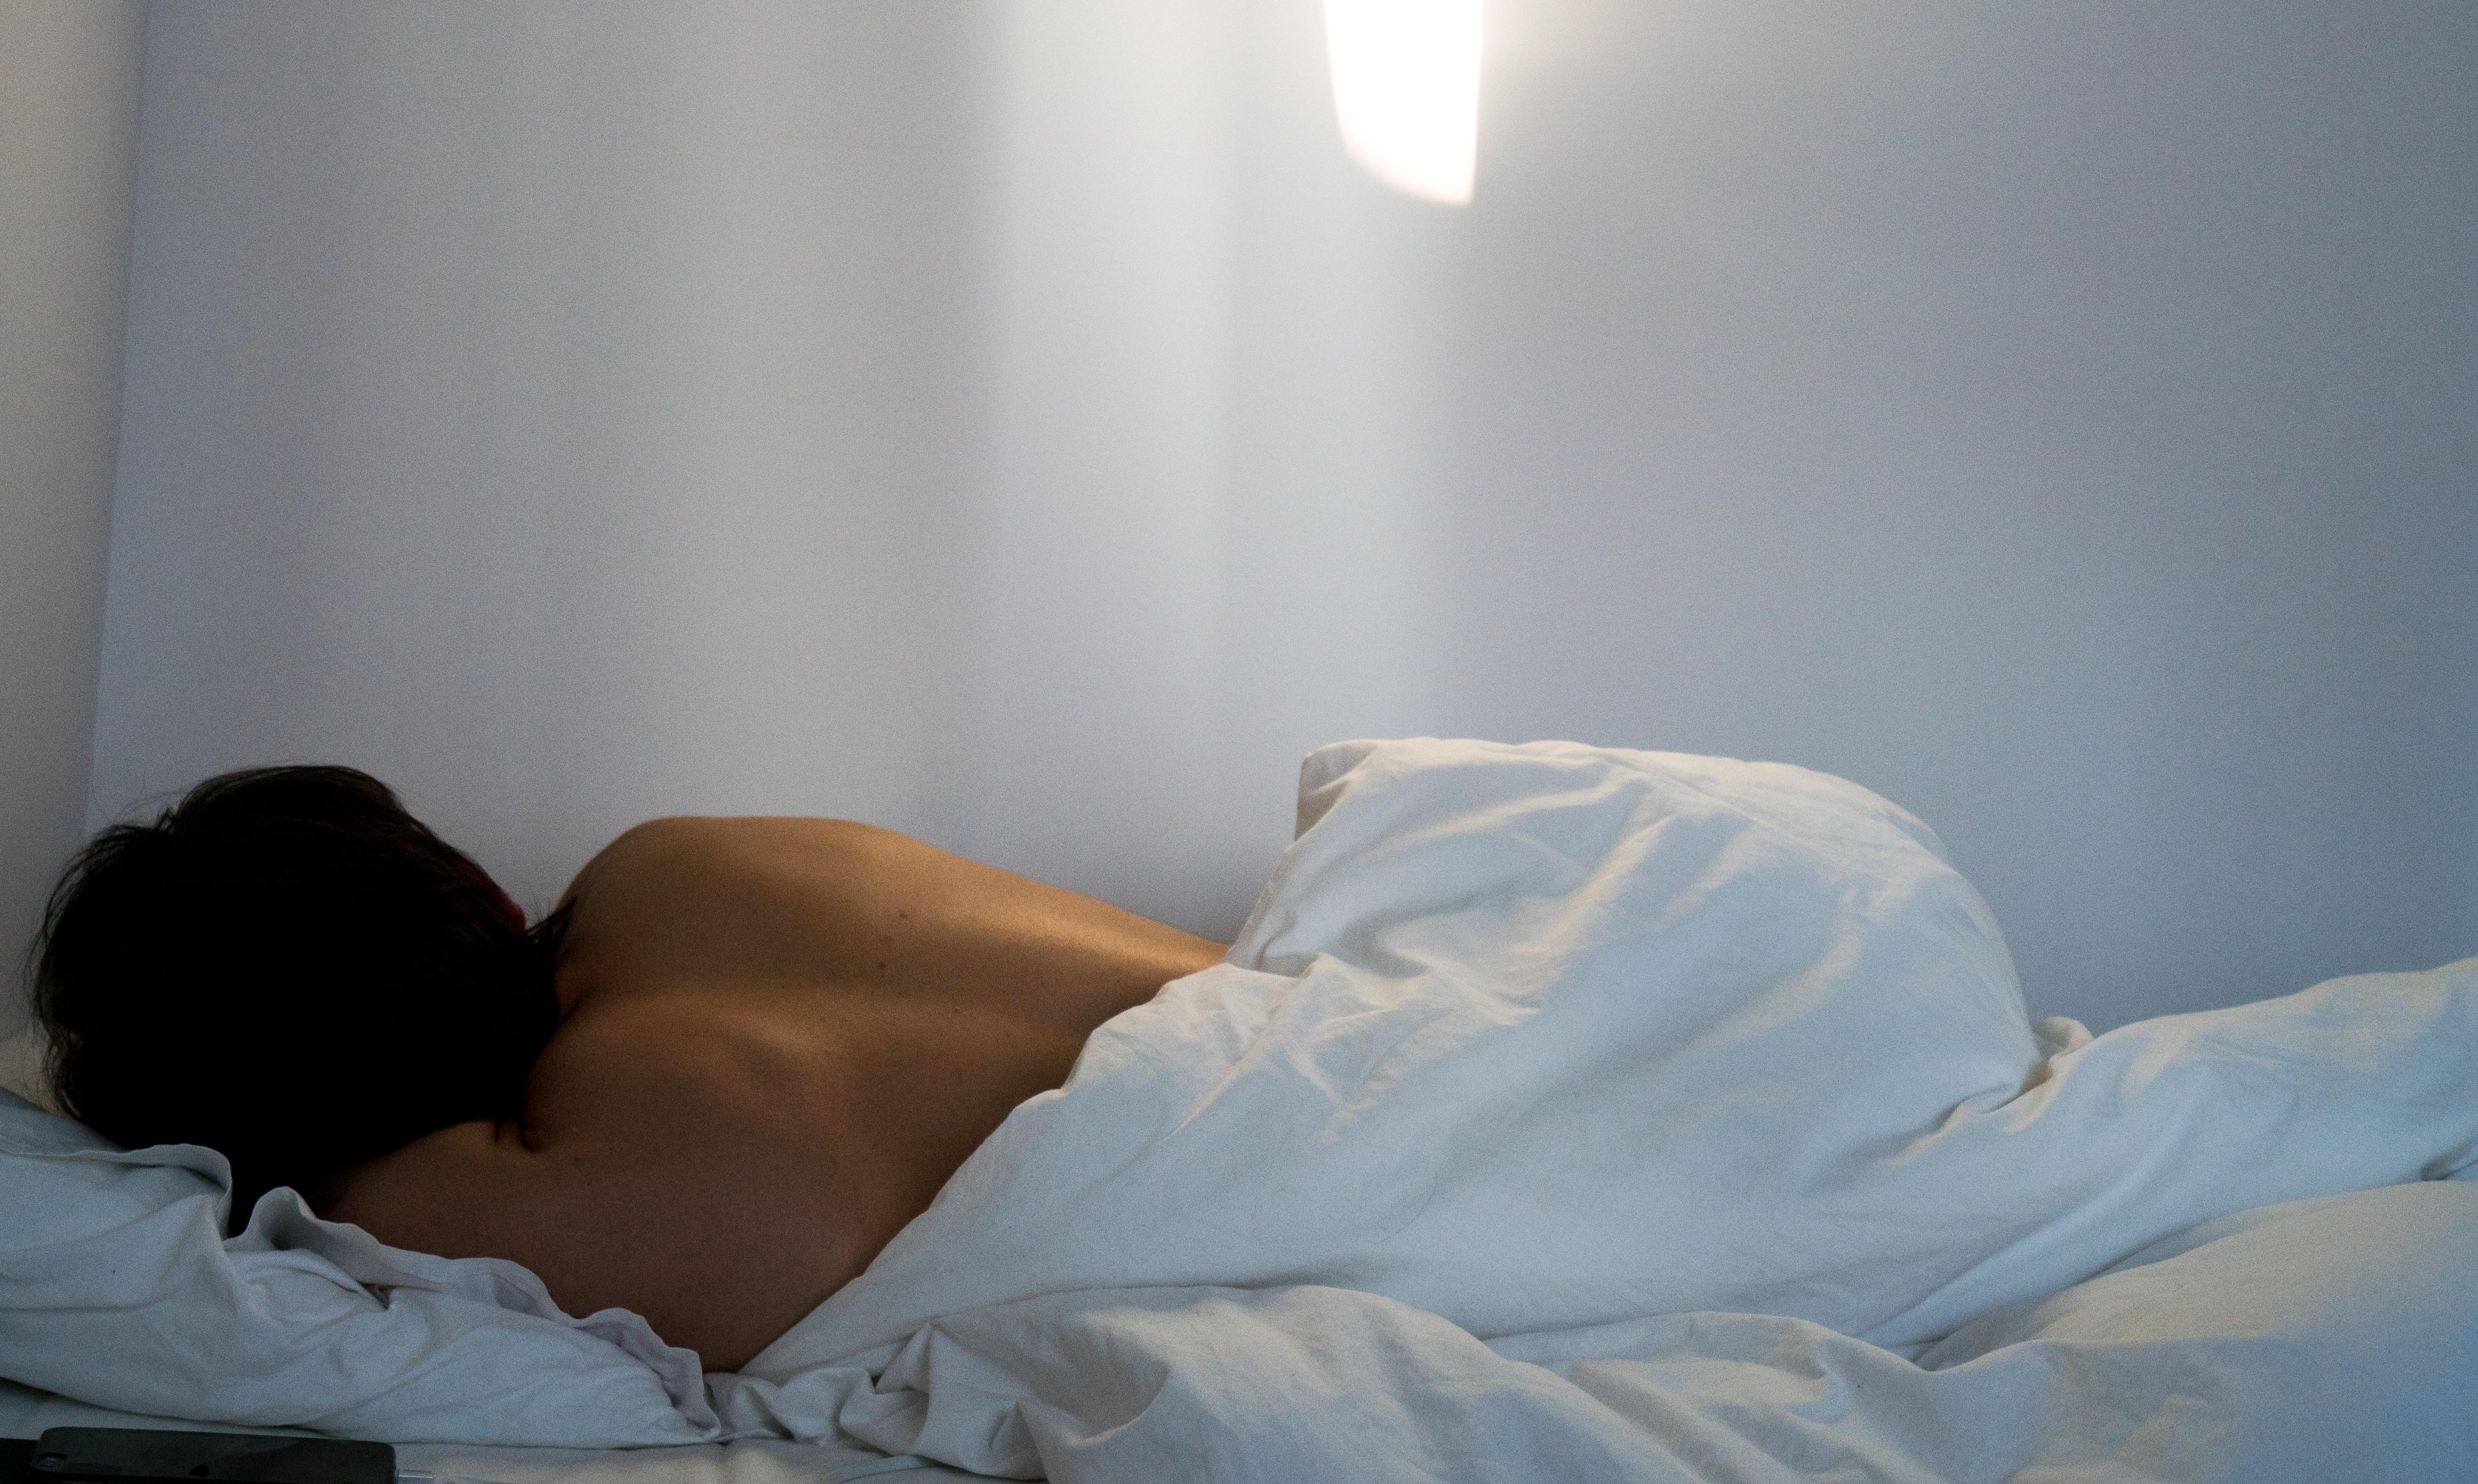 woman sleeping in white bed facing away